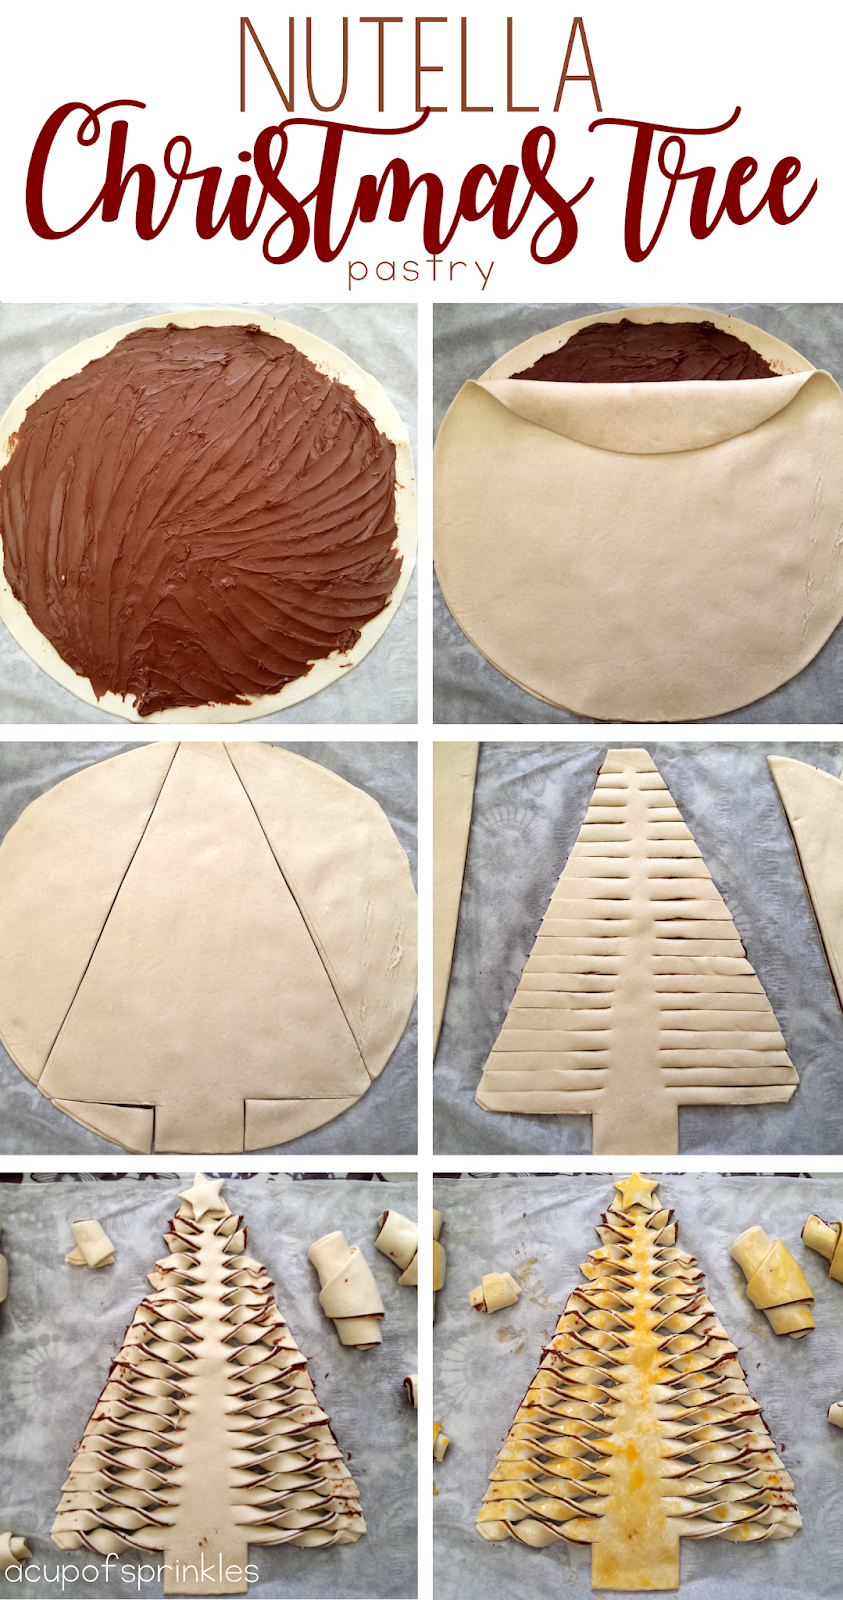 Nutella puff pastry dessert